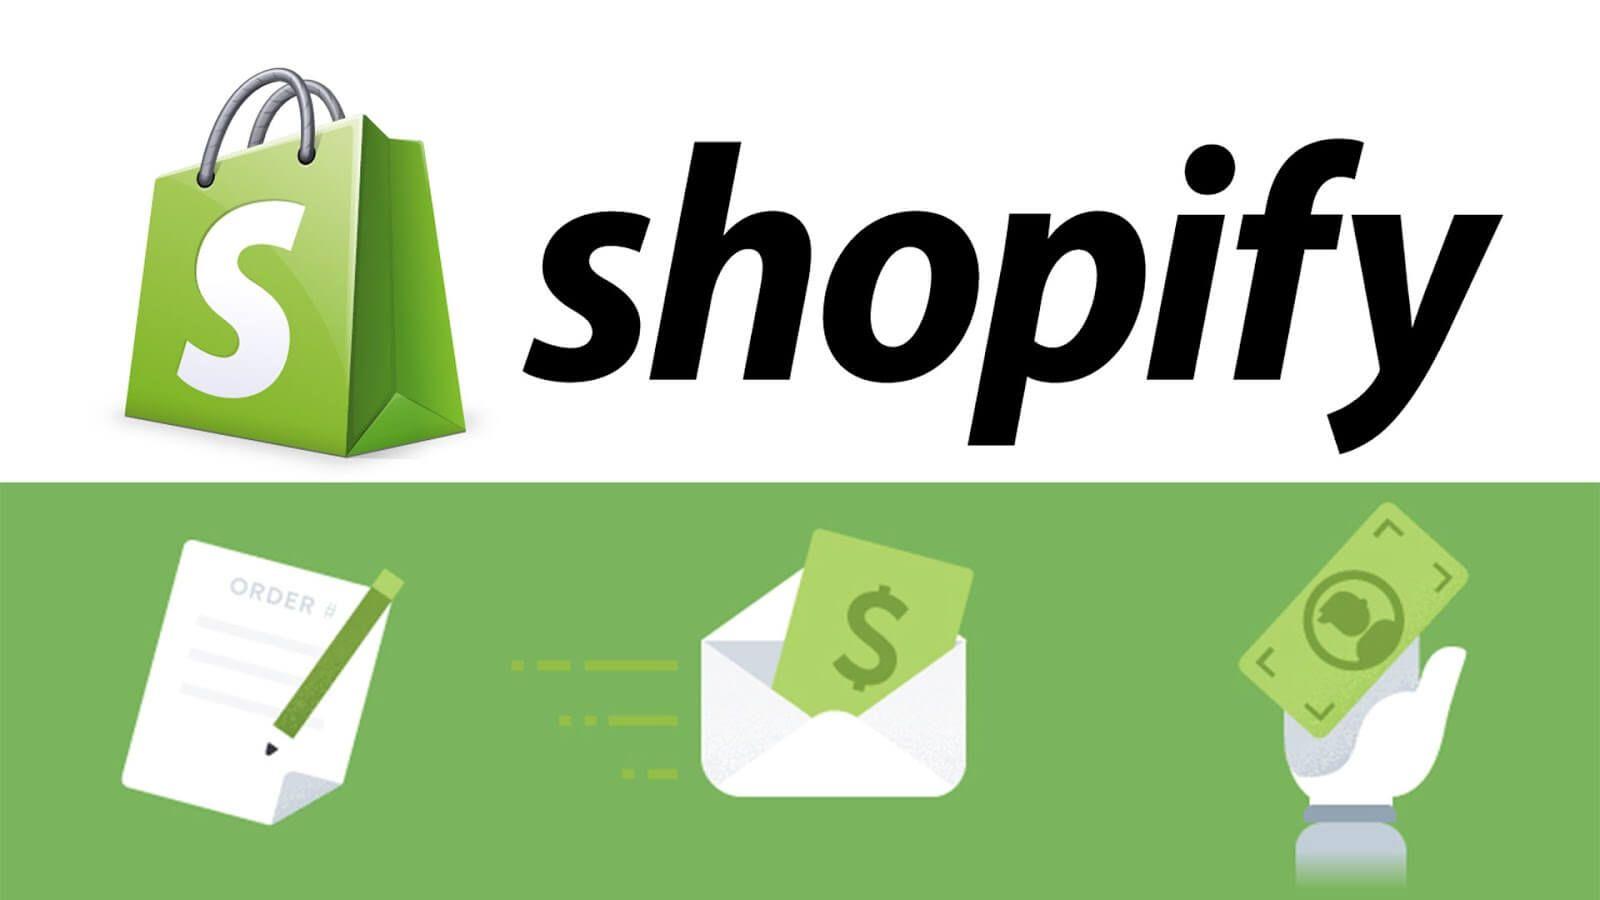 website development with Shopify. Shopify